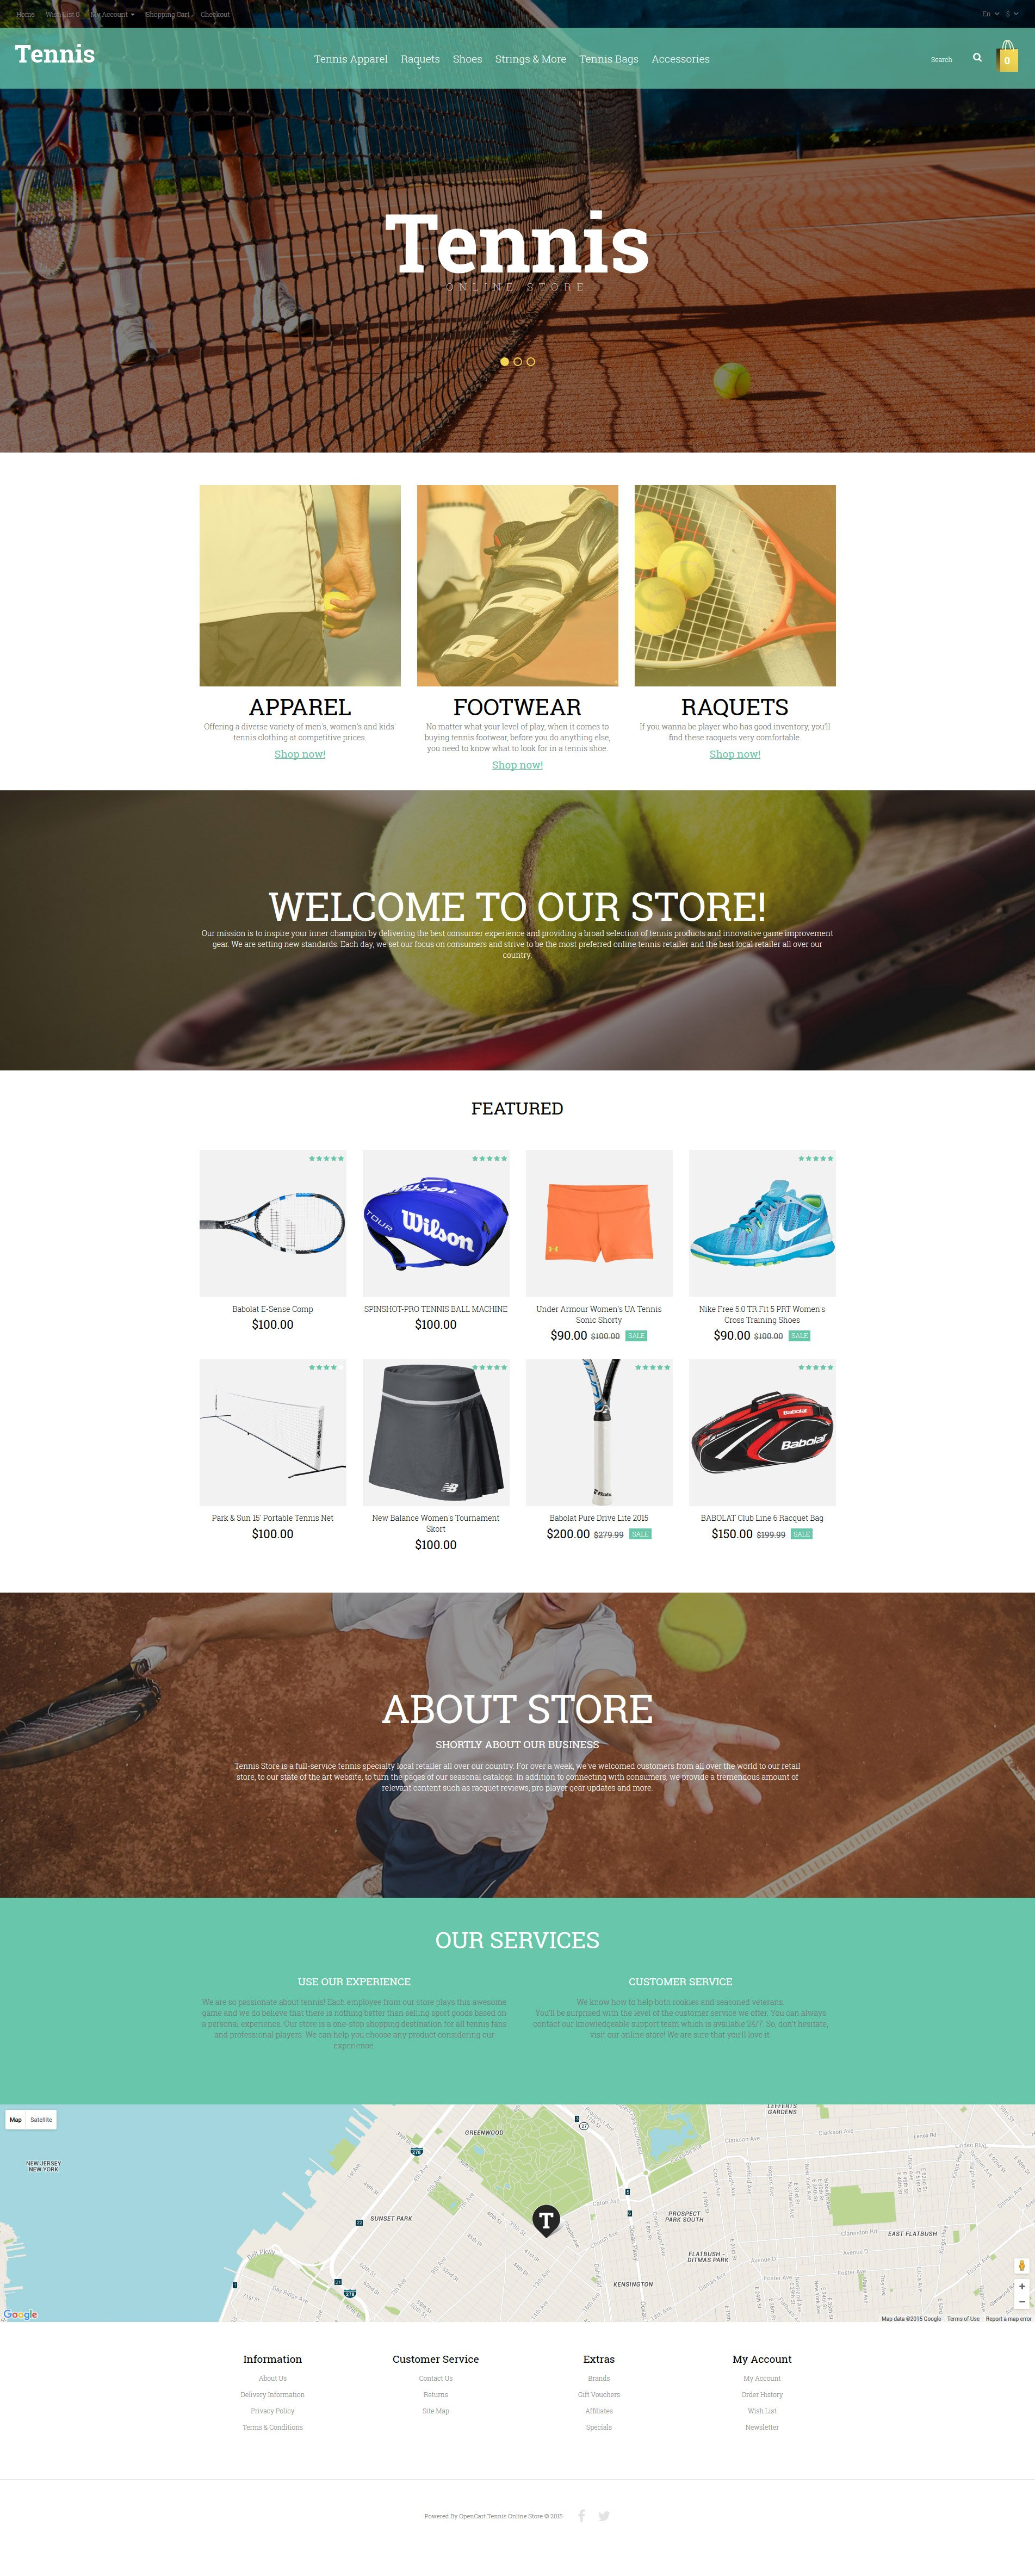 Адаптивный OpenCart шаблон №55799 на тему теннис